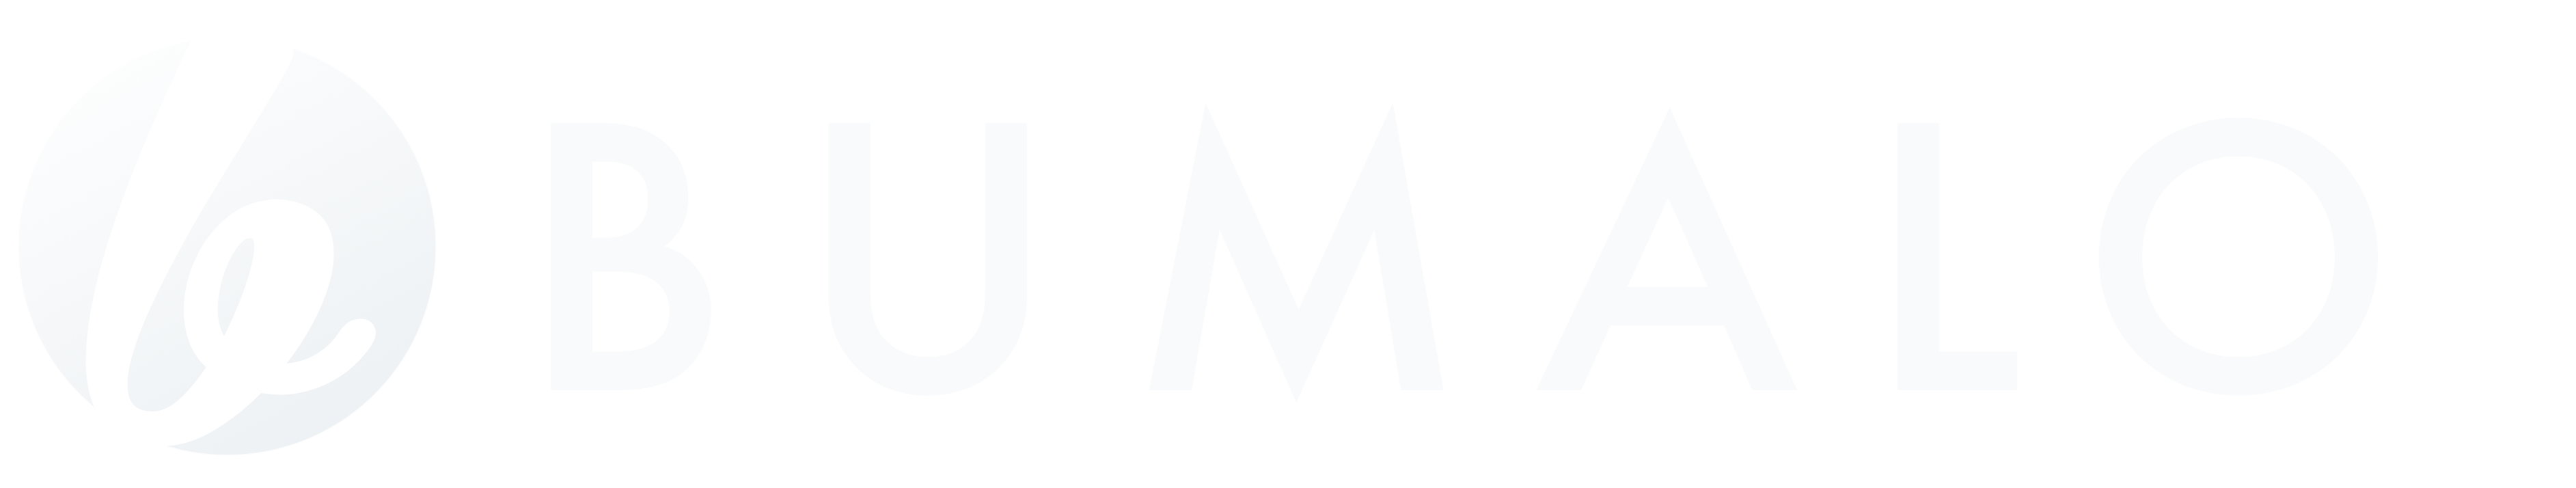 logo-bumalo3